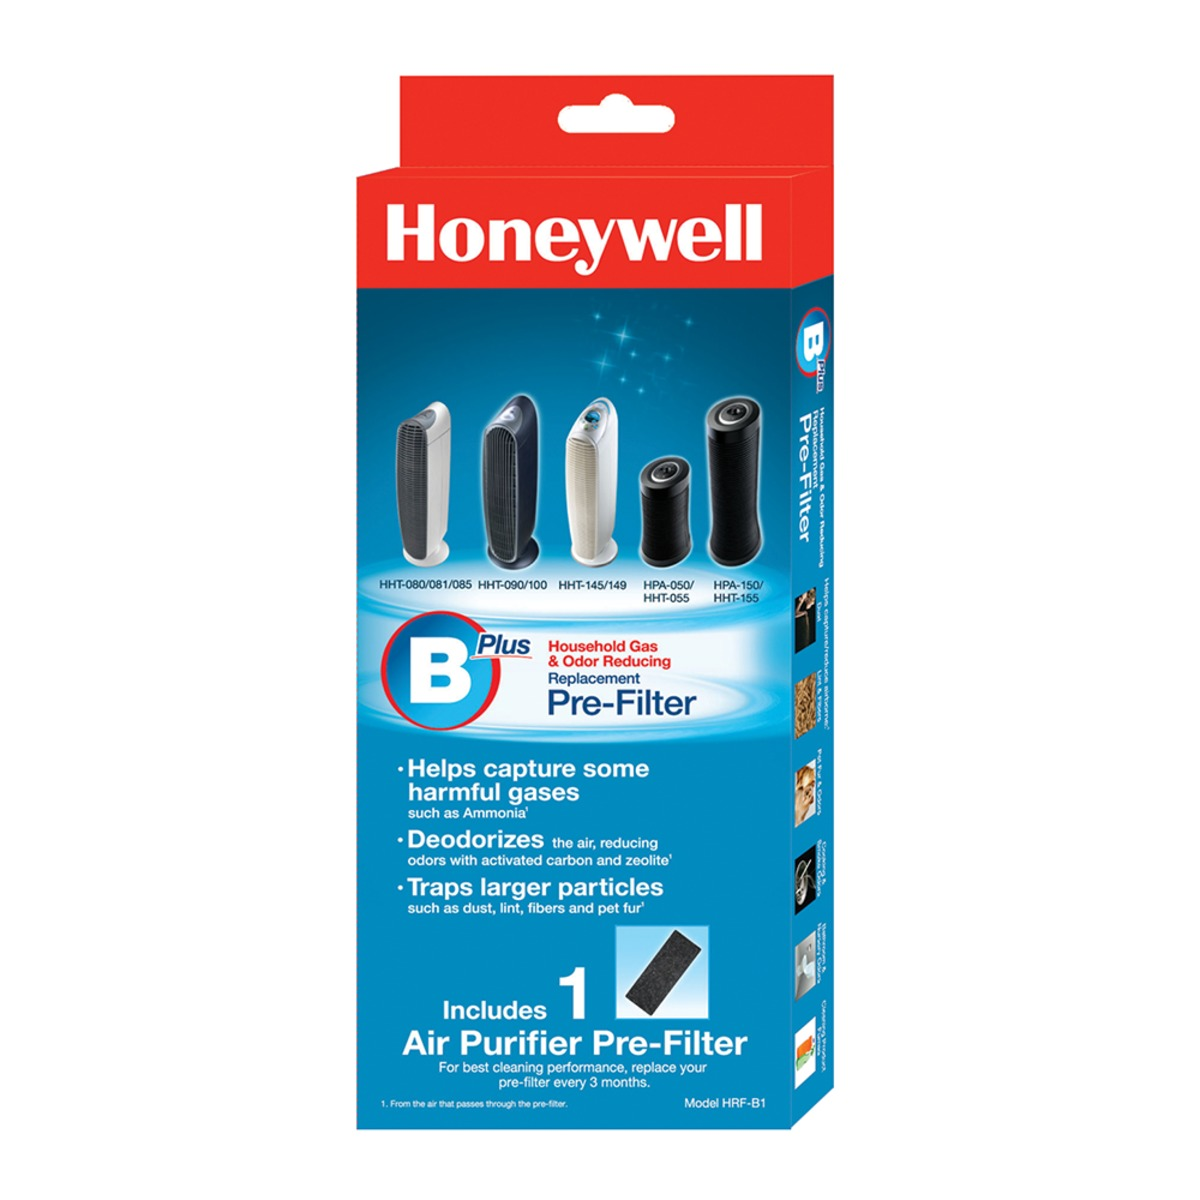 Honeywell CZ除臭濾網2盒入(HRF-B1)